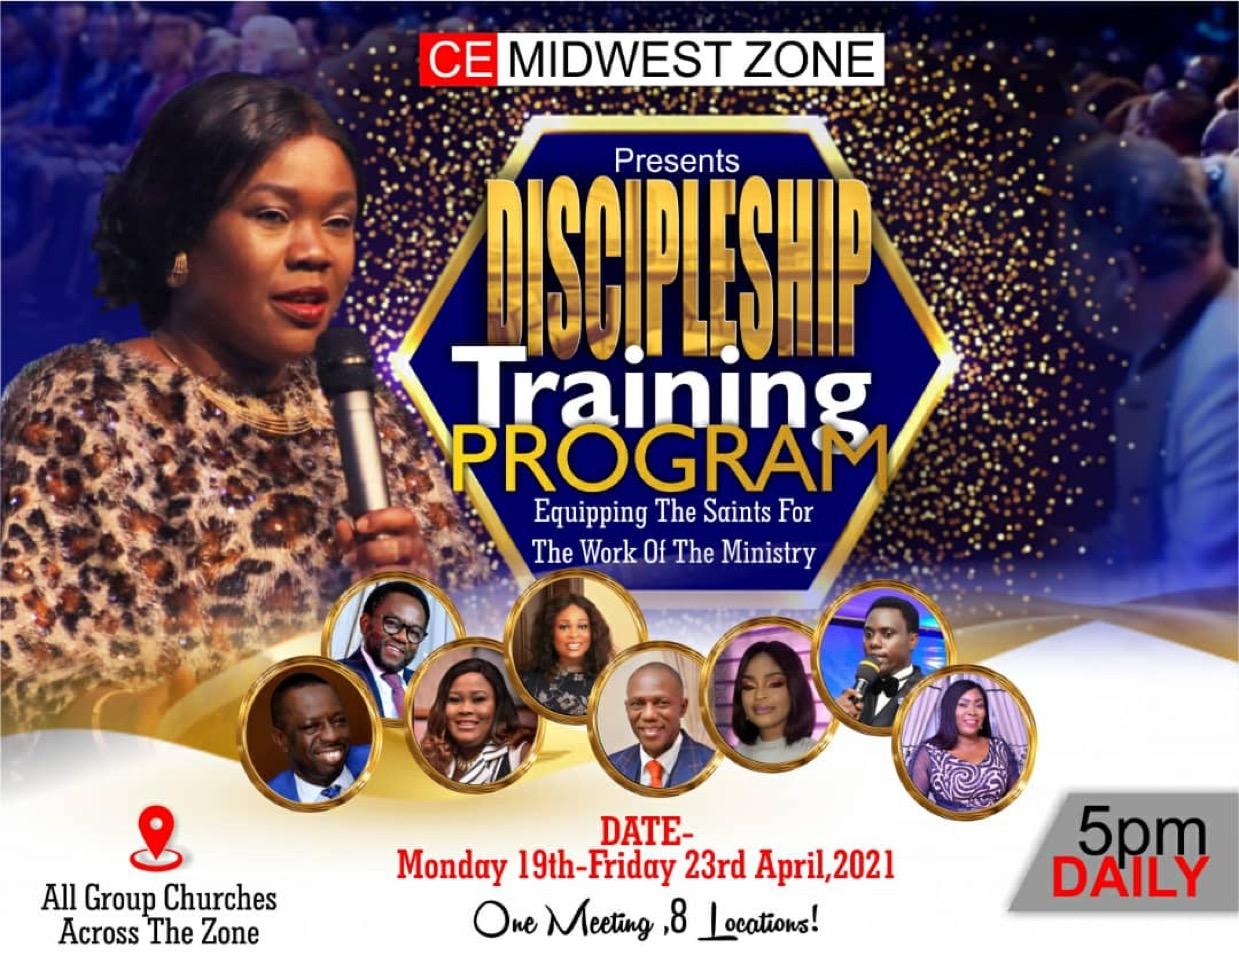 DISCIPLESHIP TRAINING PROGRAM ON MY